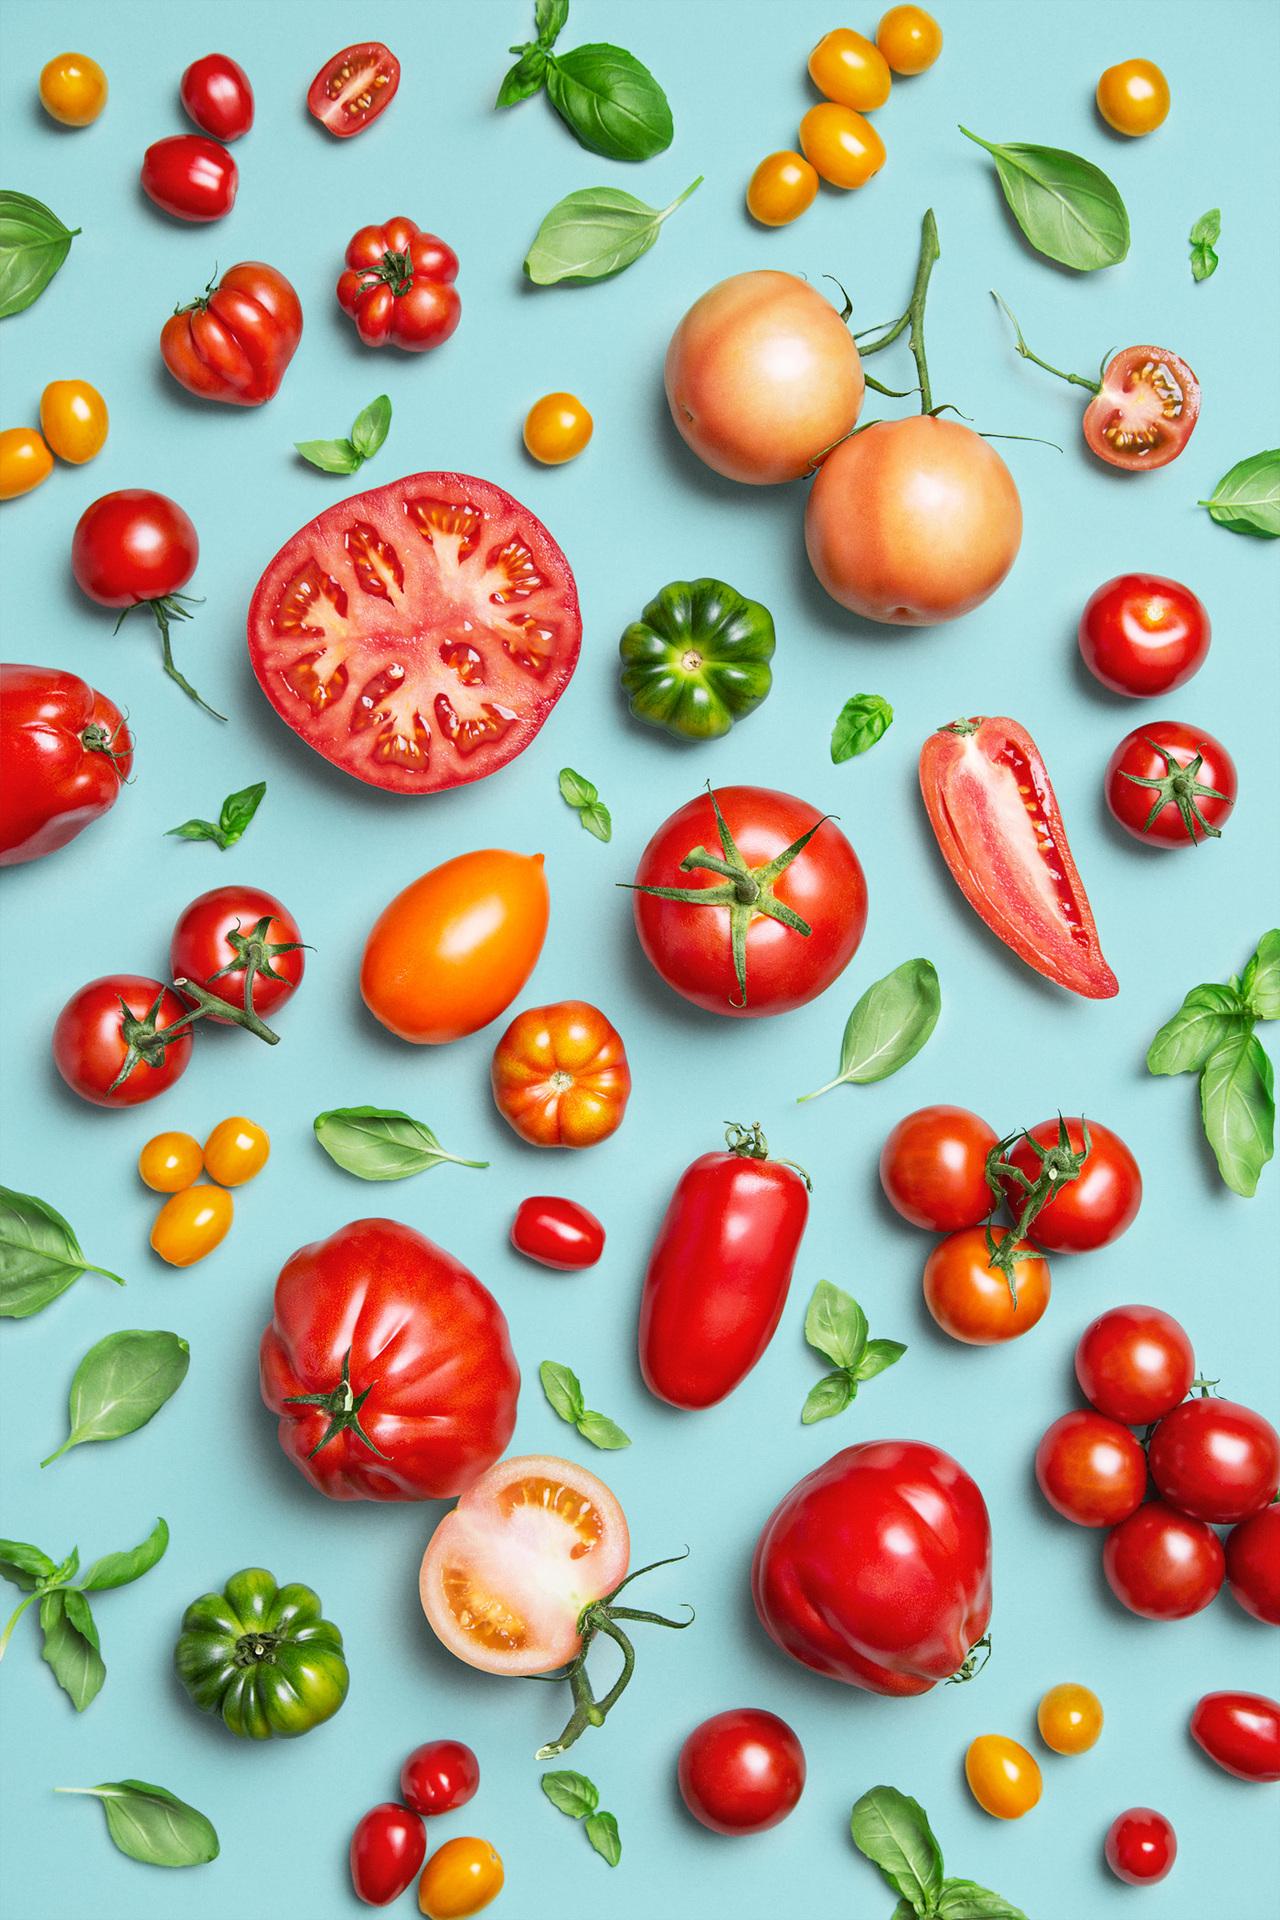 Linda Ydemar - Food patterns